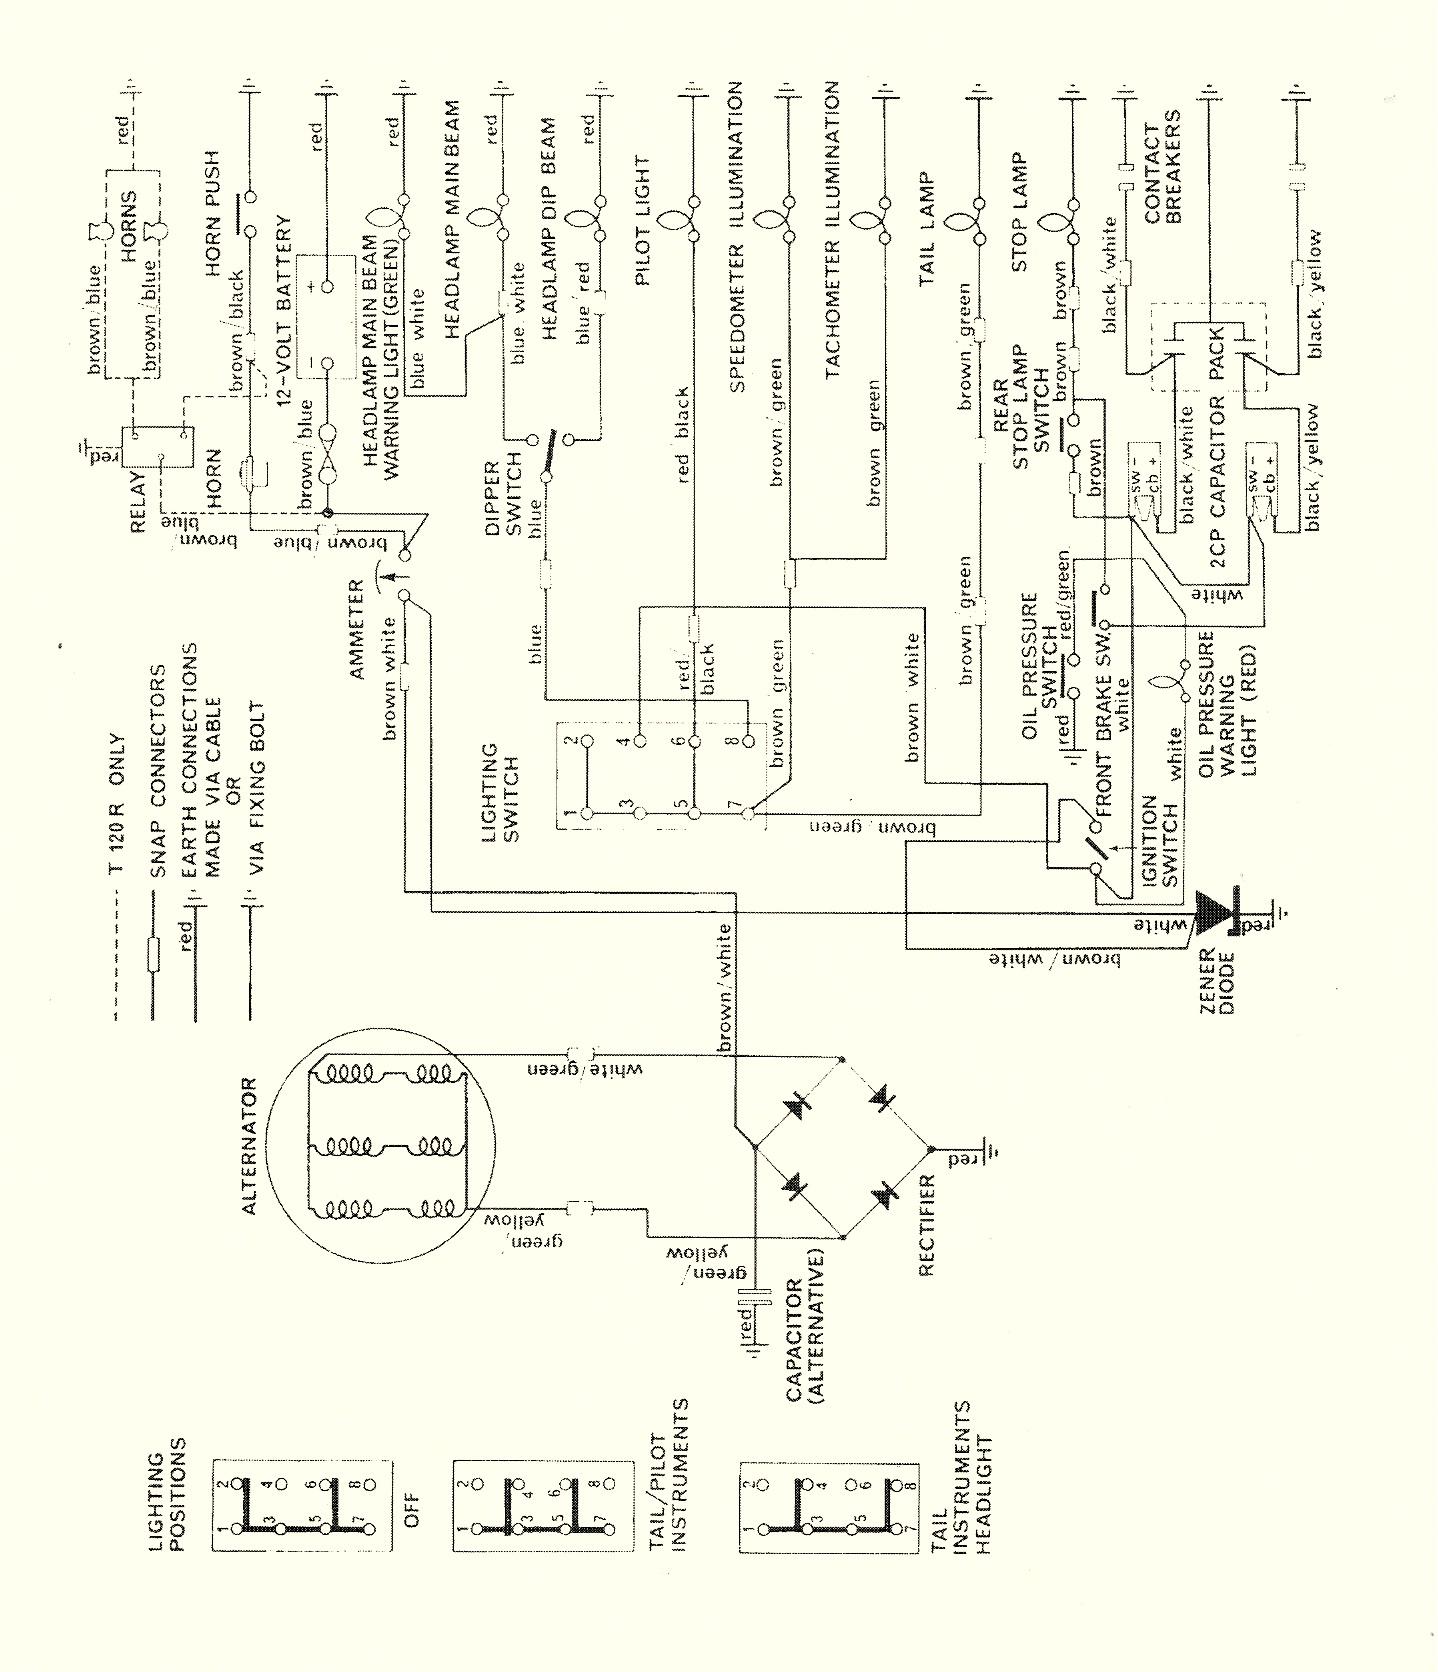 triumph spitfire mk3 wiring diagram triumph image triumph spitfire wiring diagram triumph auto wiring diagram on triumph spitfire mk3 wiring diagram